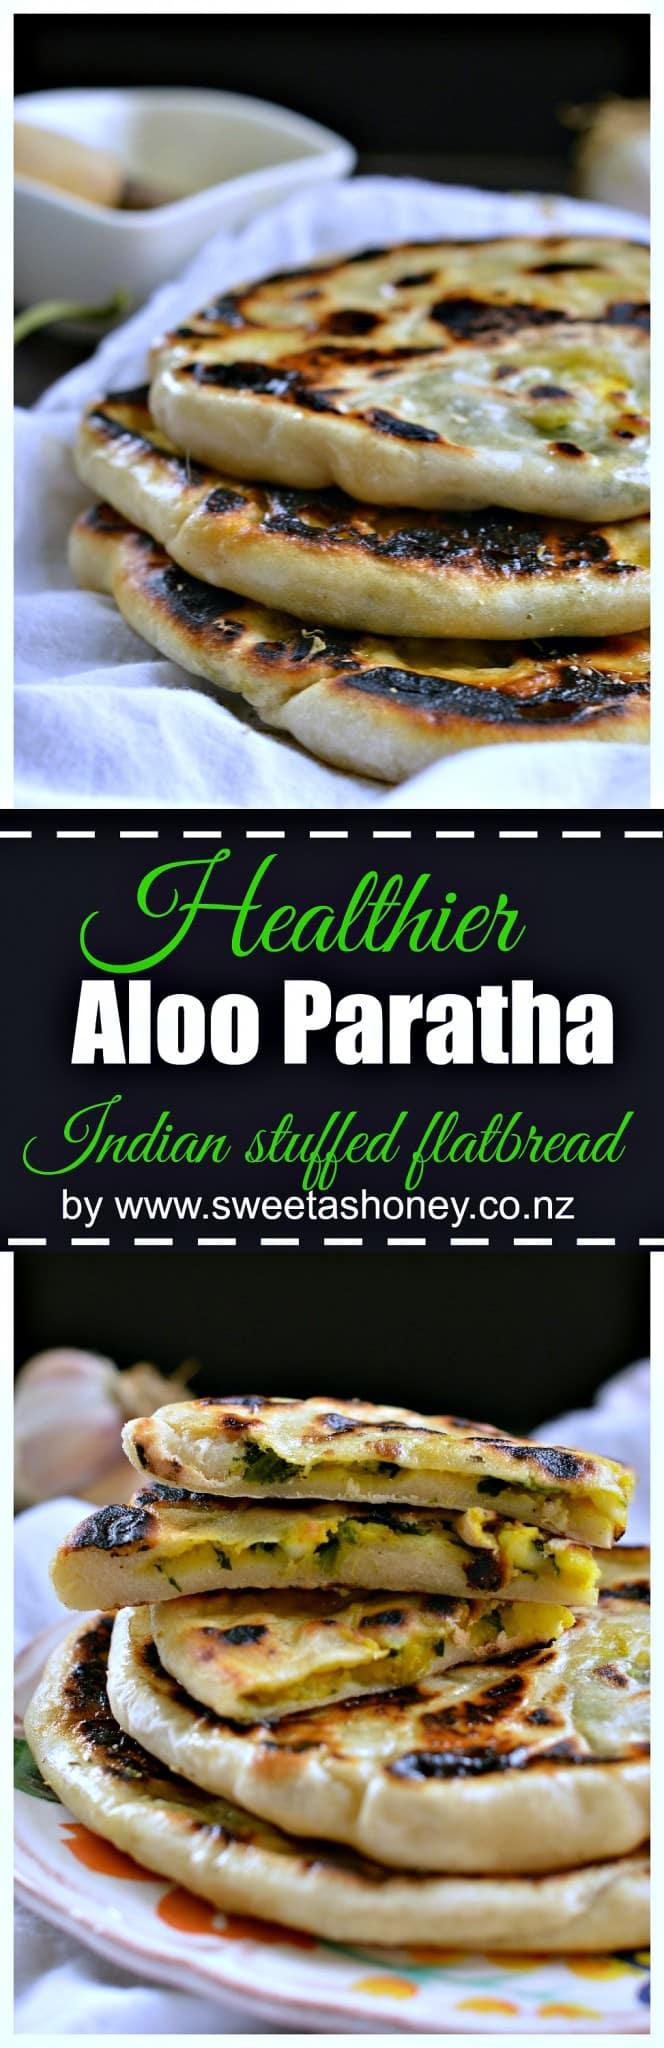 aloo paratha stuffed bread